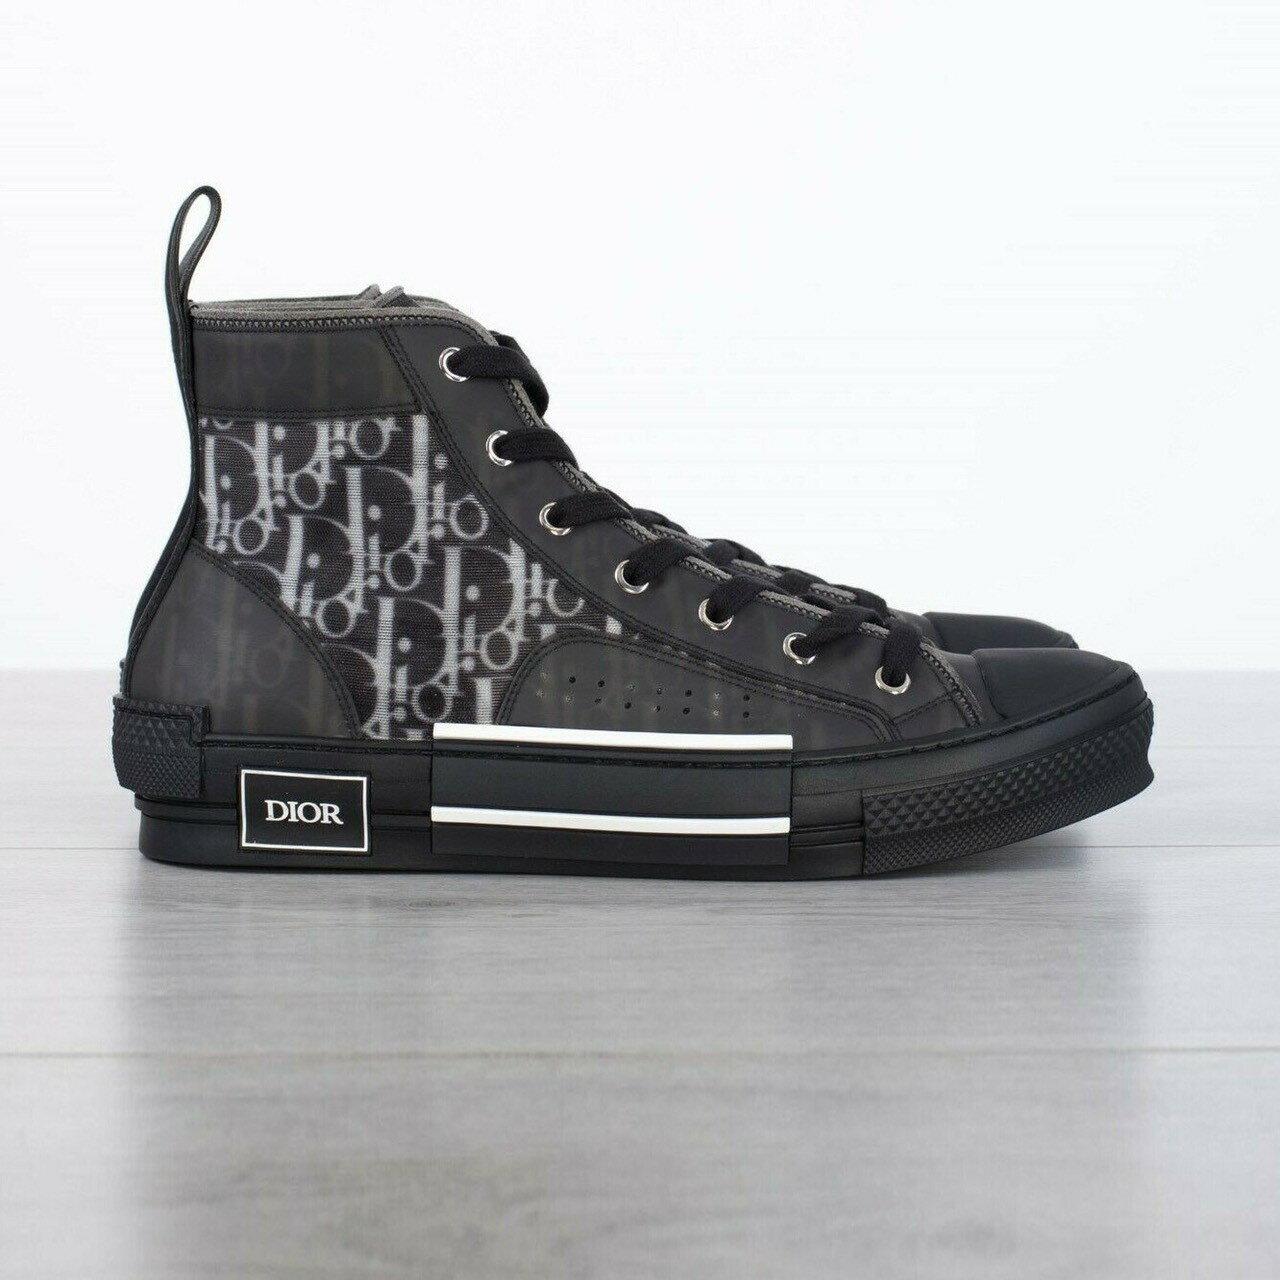 DIOR 黑色B23老花高筒鞋 尺寸39 39.5 40 40.5 41 41.5 42 42.5 折扣